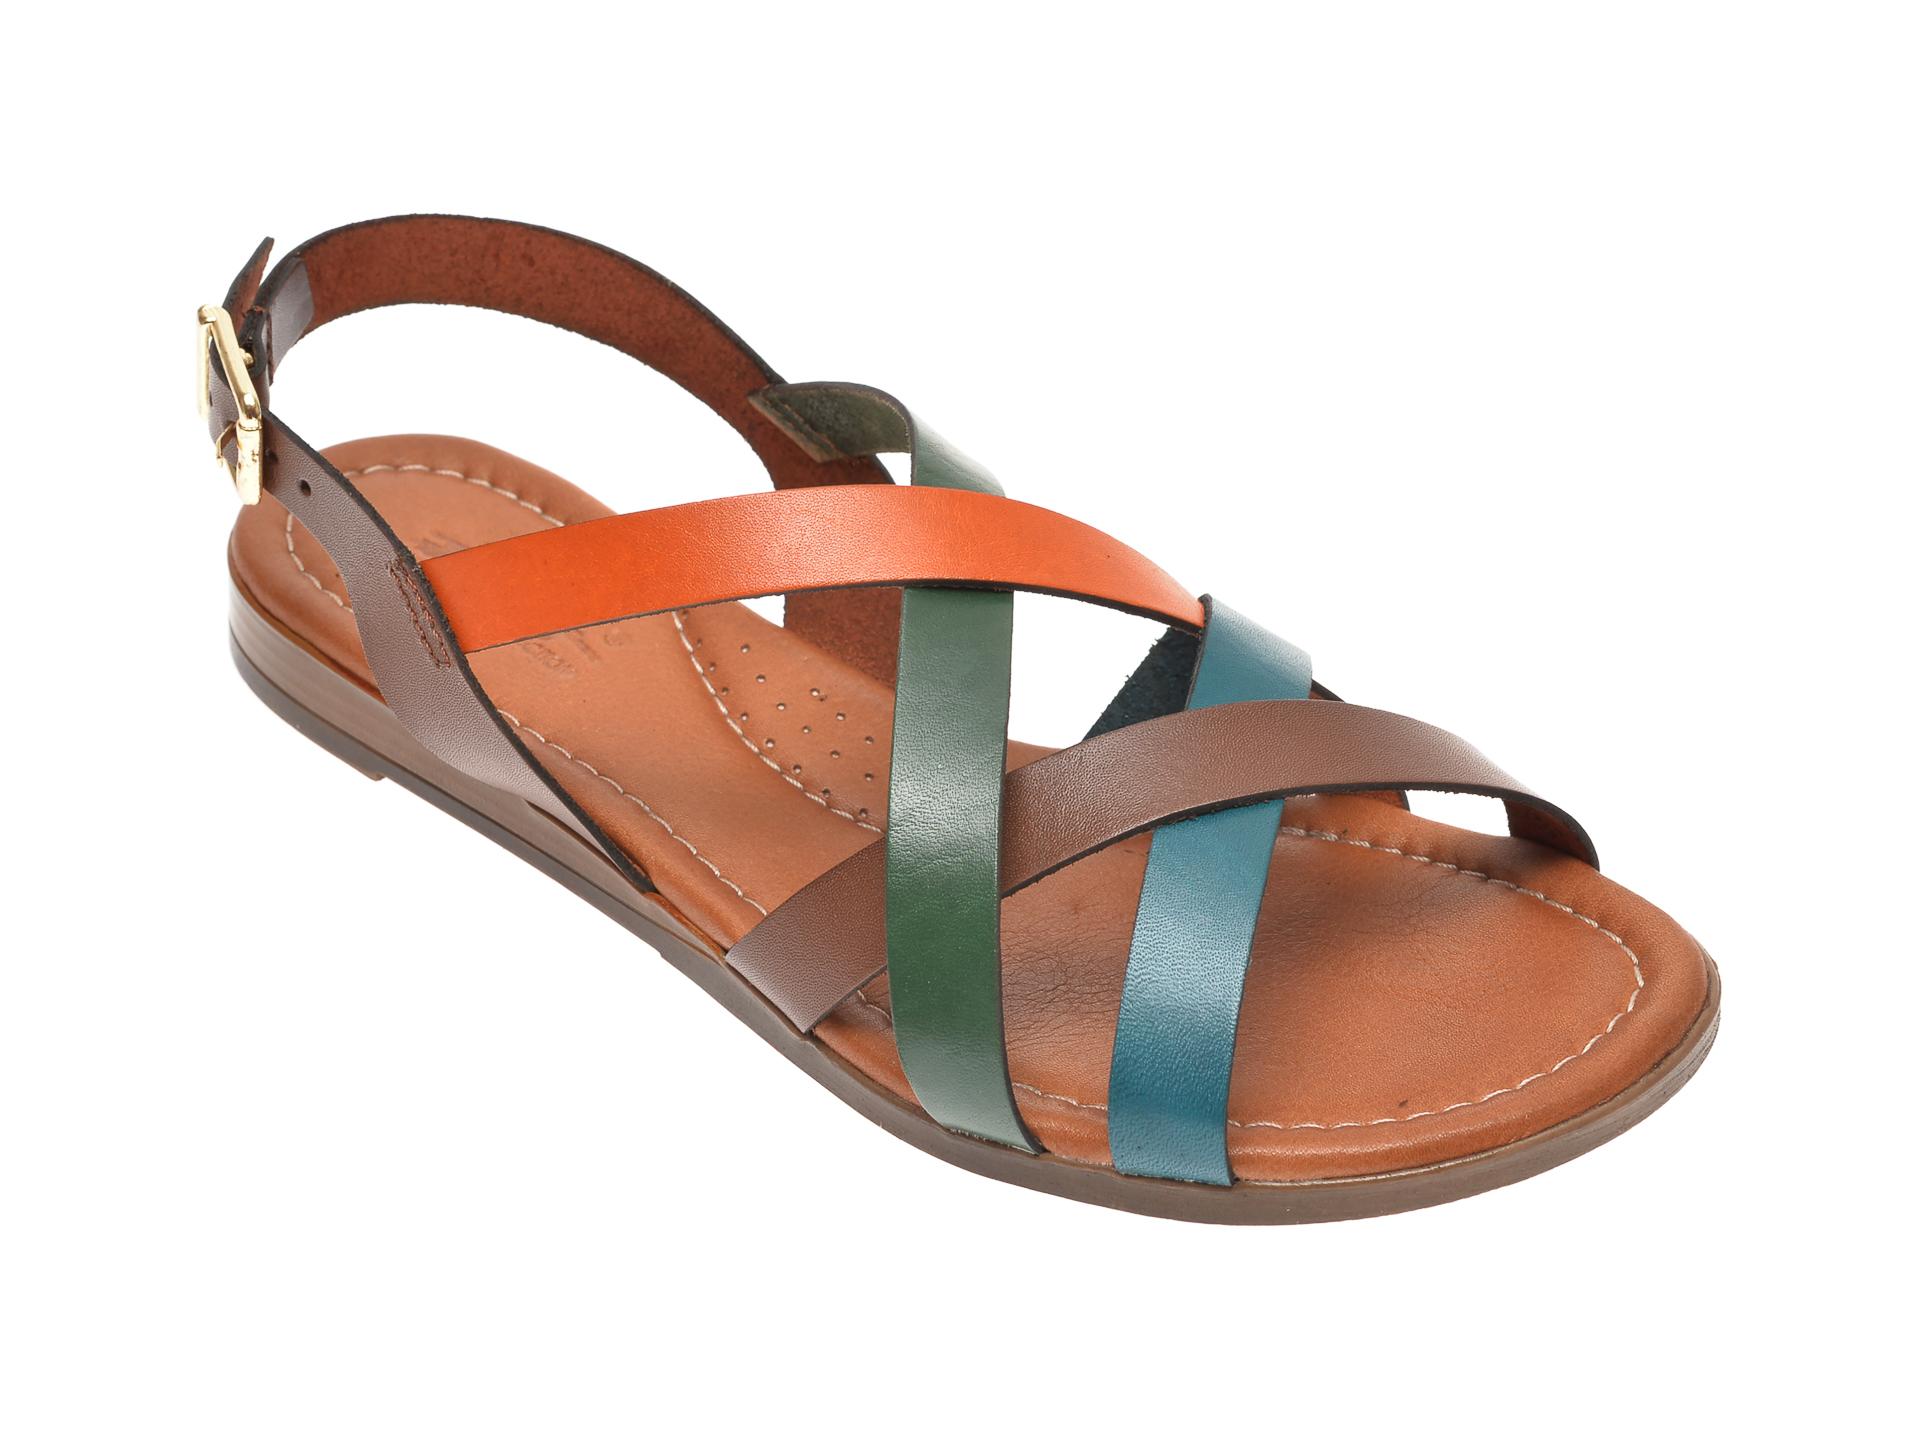 Sandale PASS COLLECTION multicolor, 1504, din piele naturala